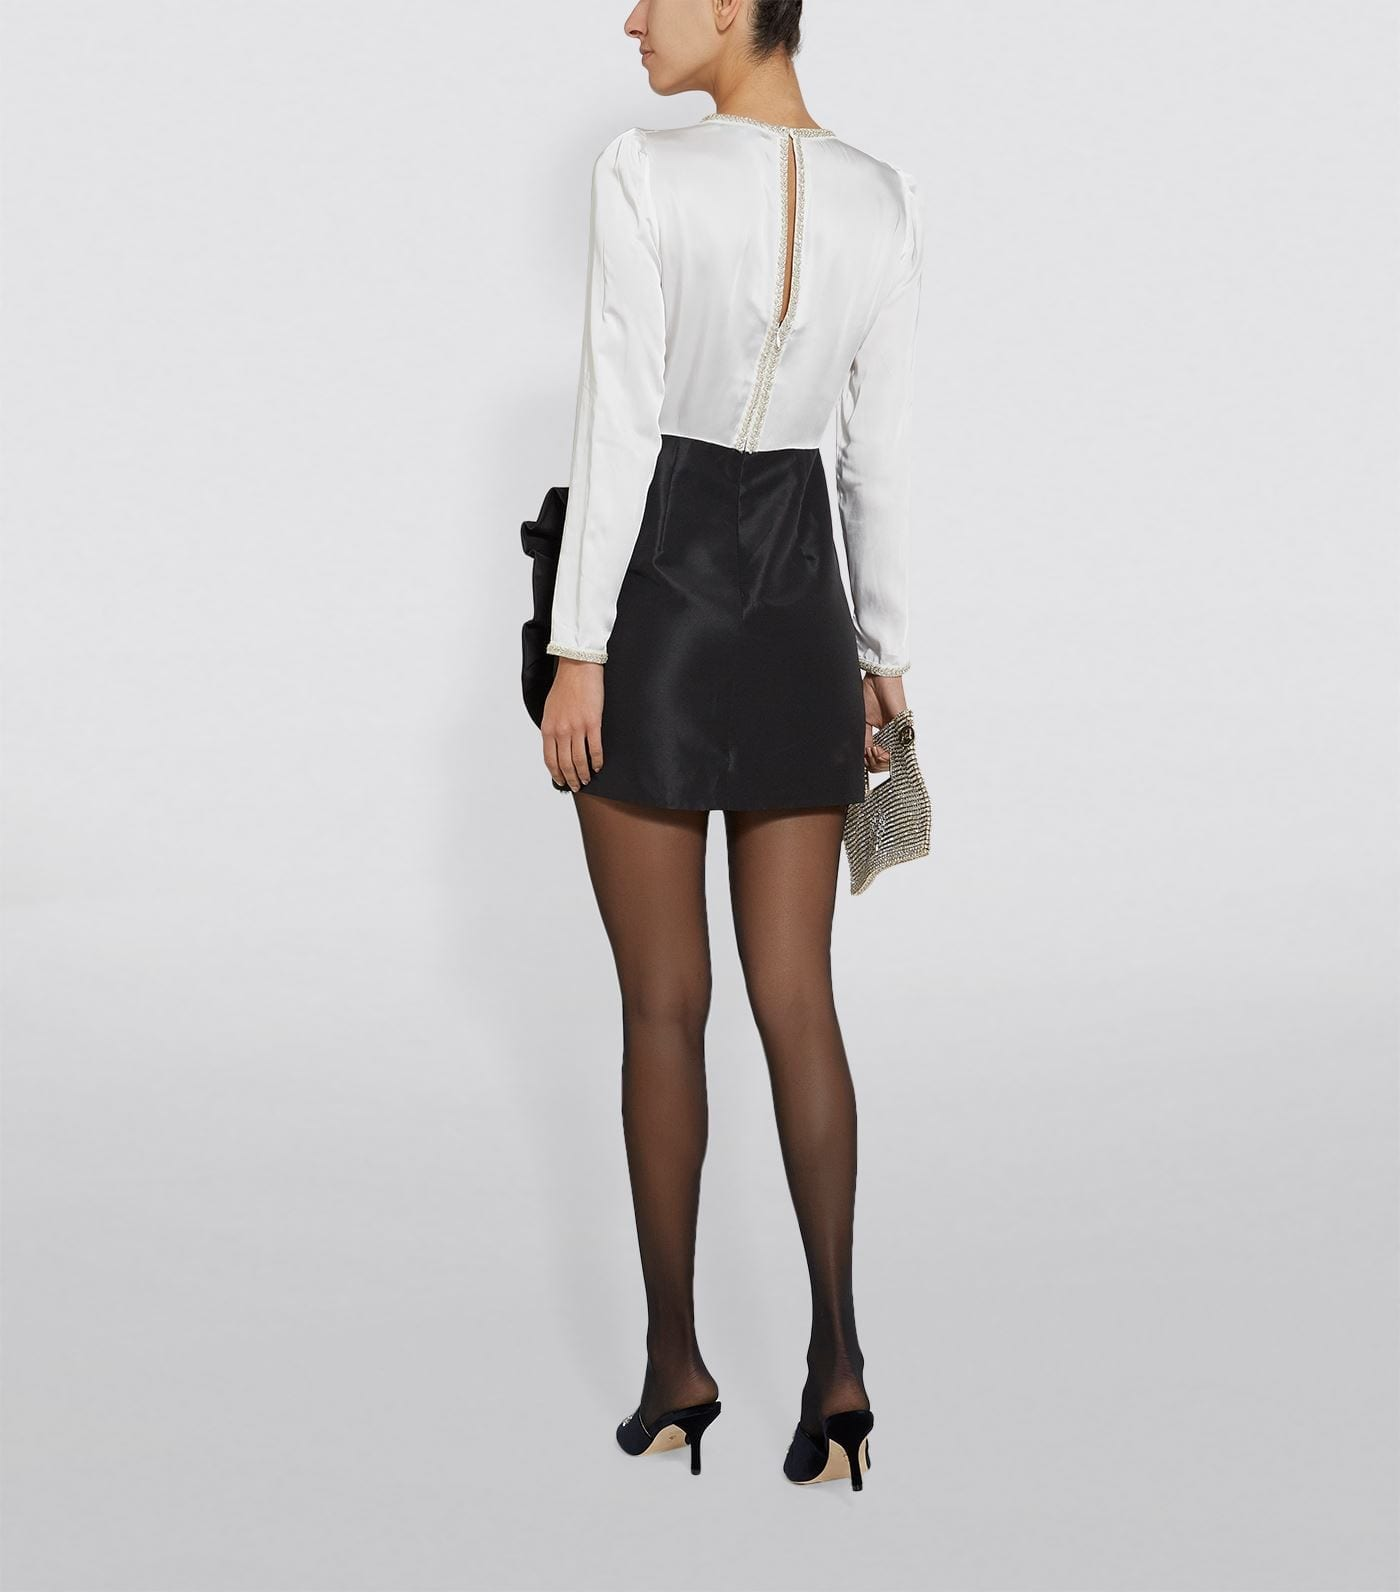 SELF-PORTRAIT Bead-Embellished Ruffle Mini Dress